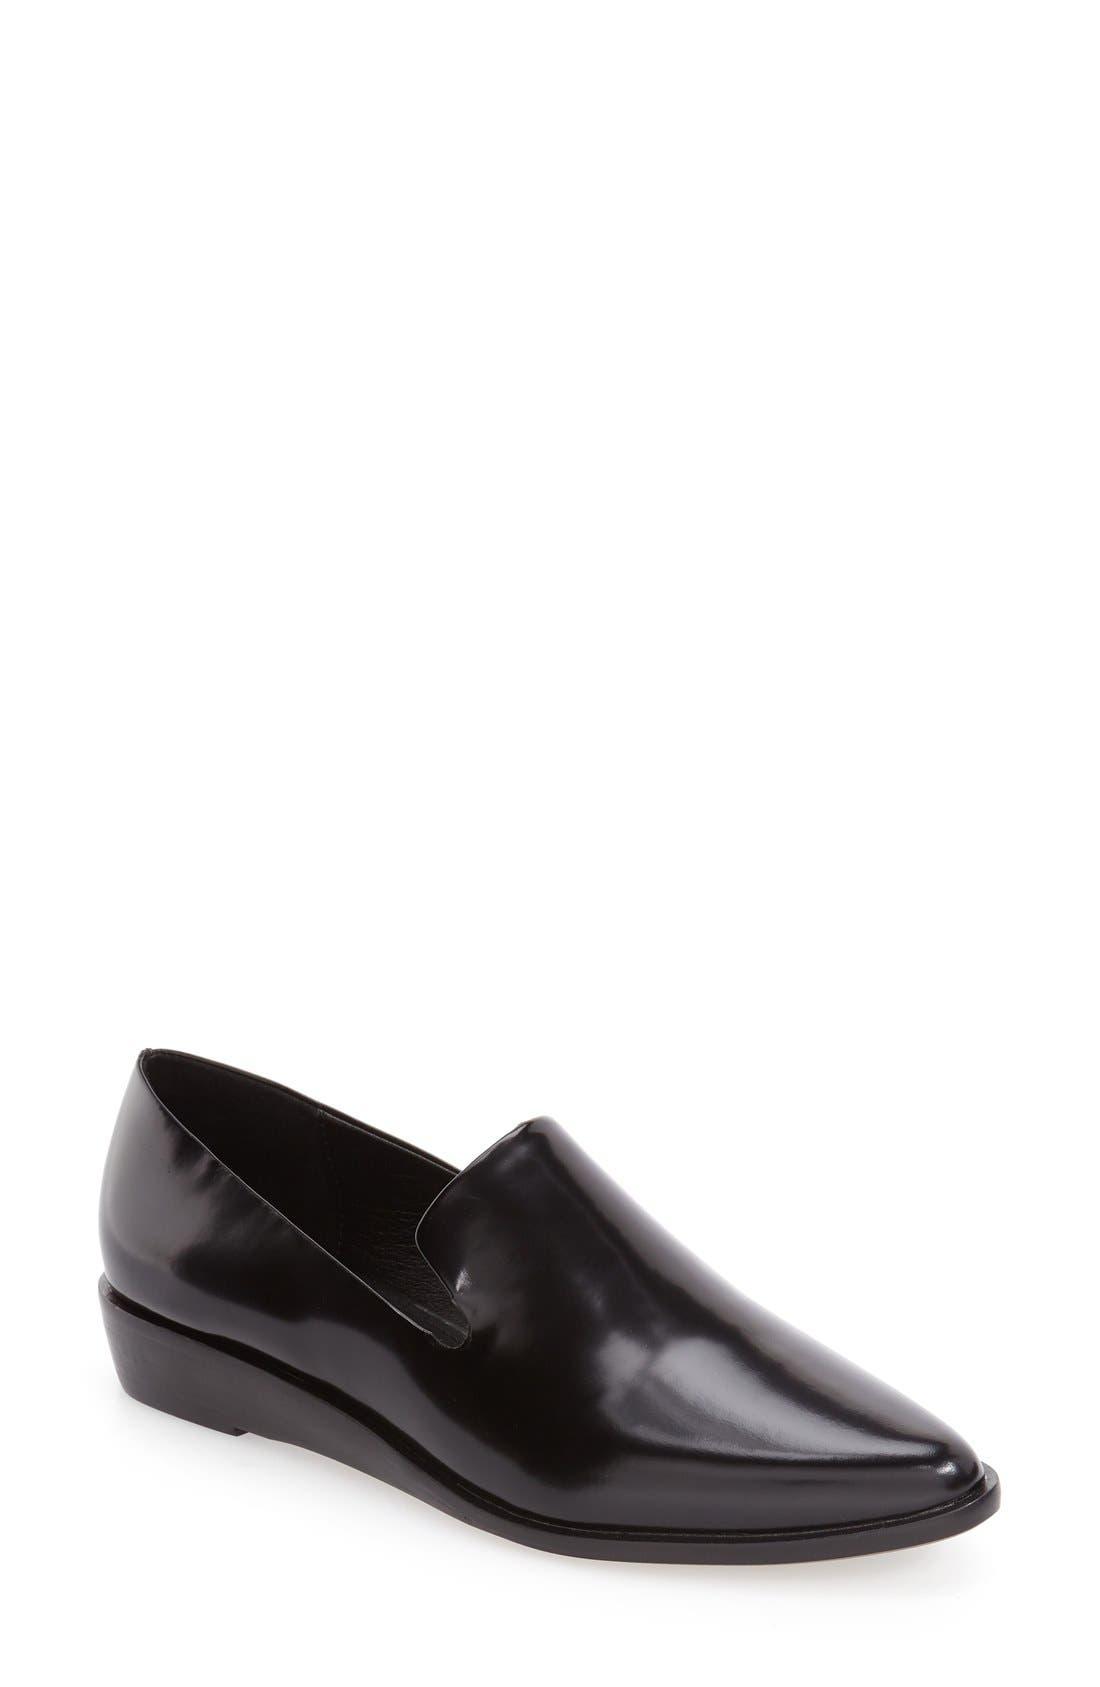 Alternate Image 1 Selected - Kelsi Dagger Brooklyn 'Abbi' Pointy Toe Flat (Women)